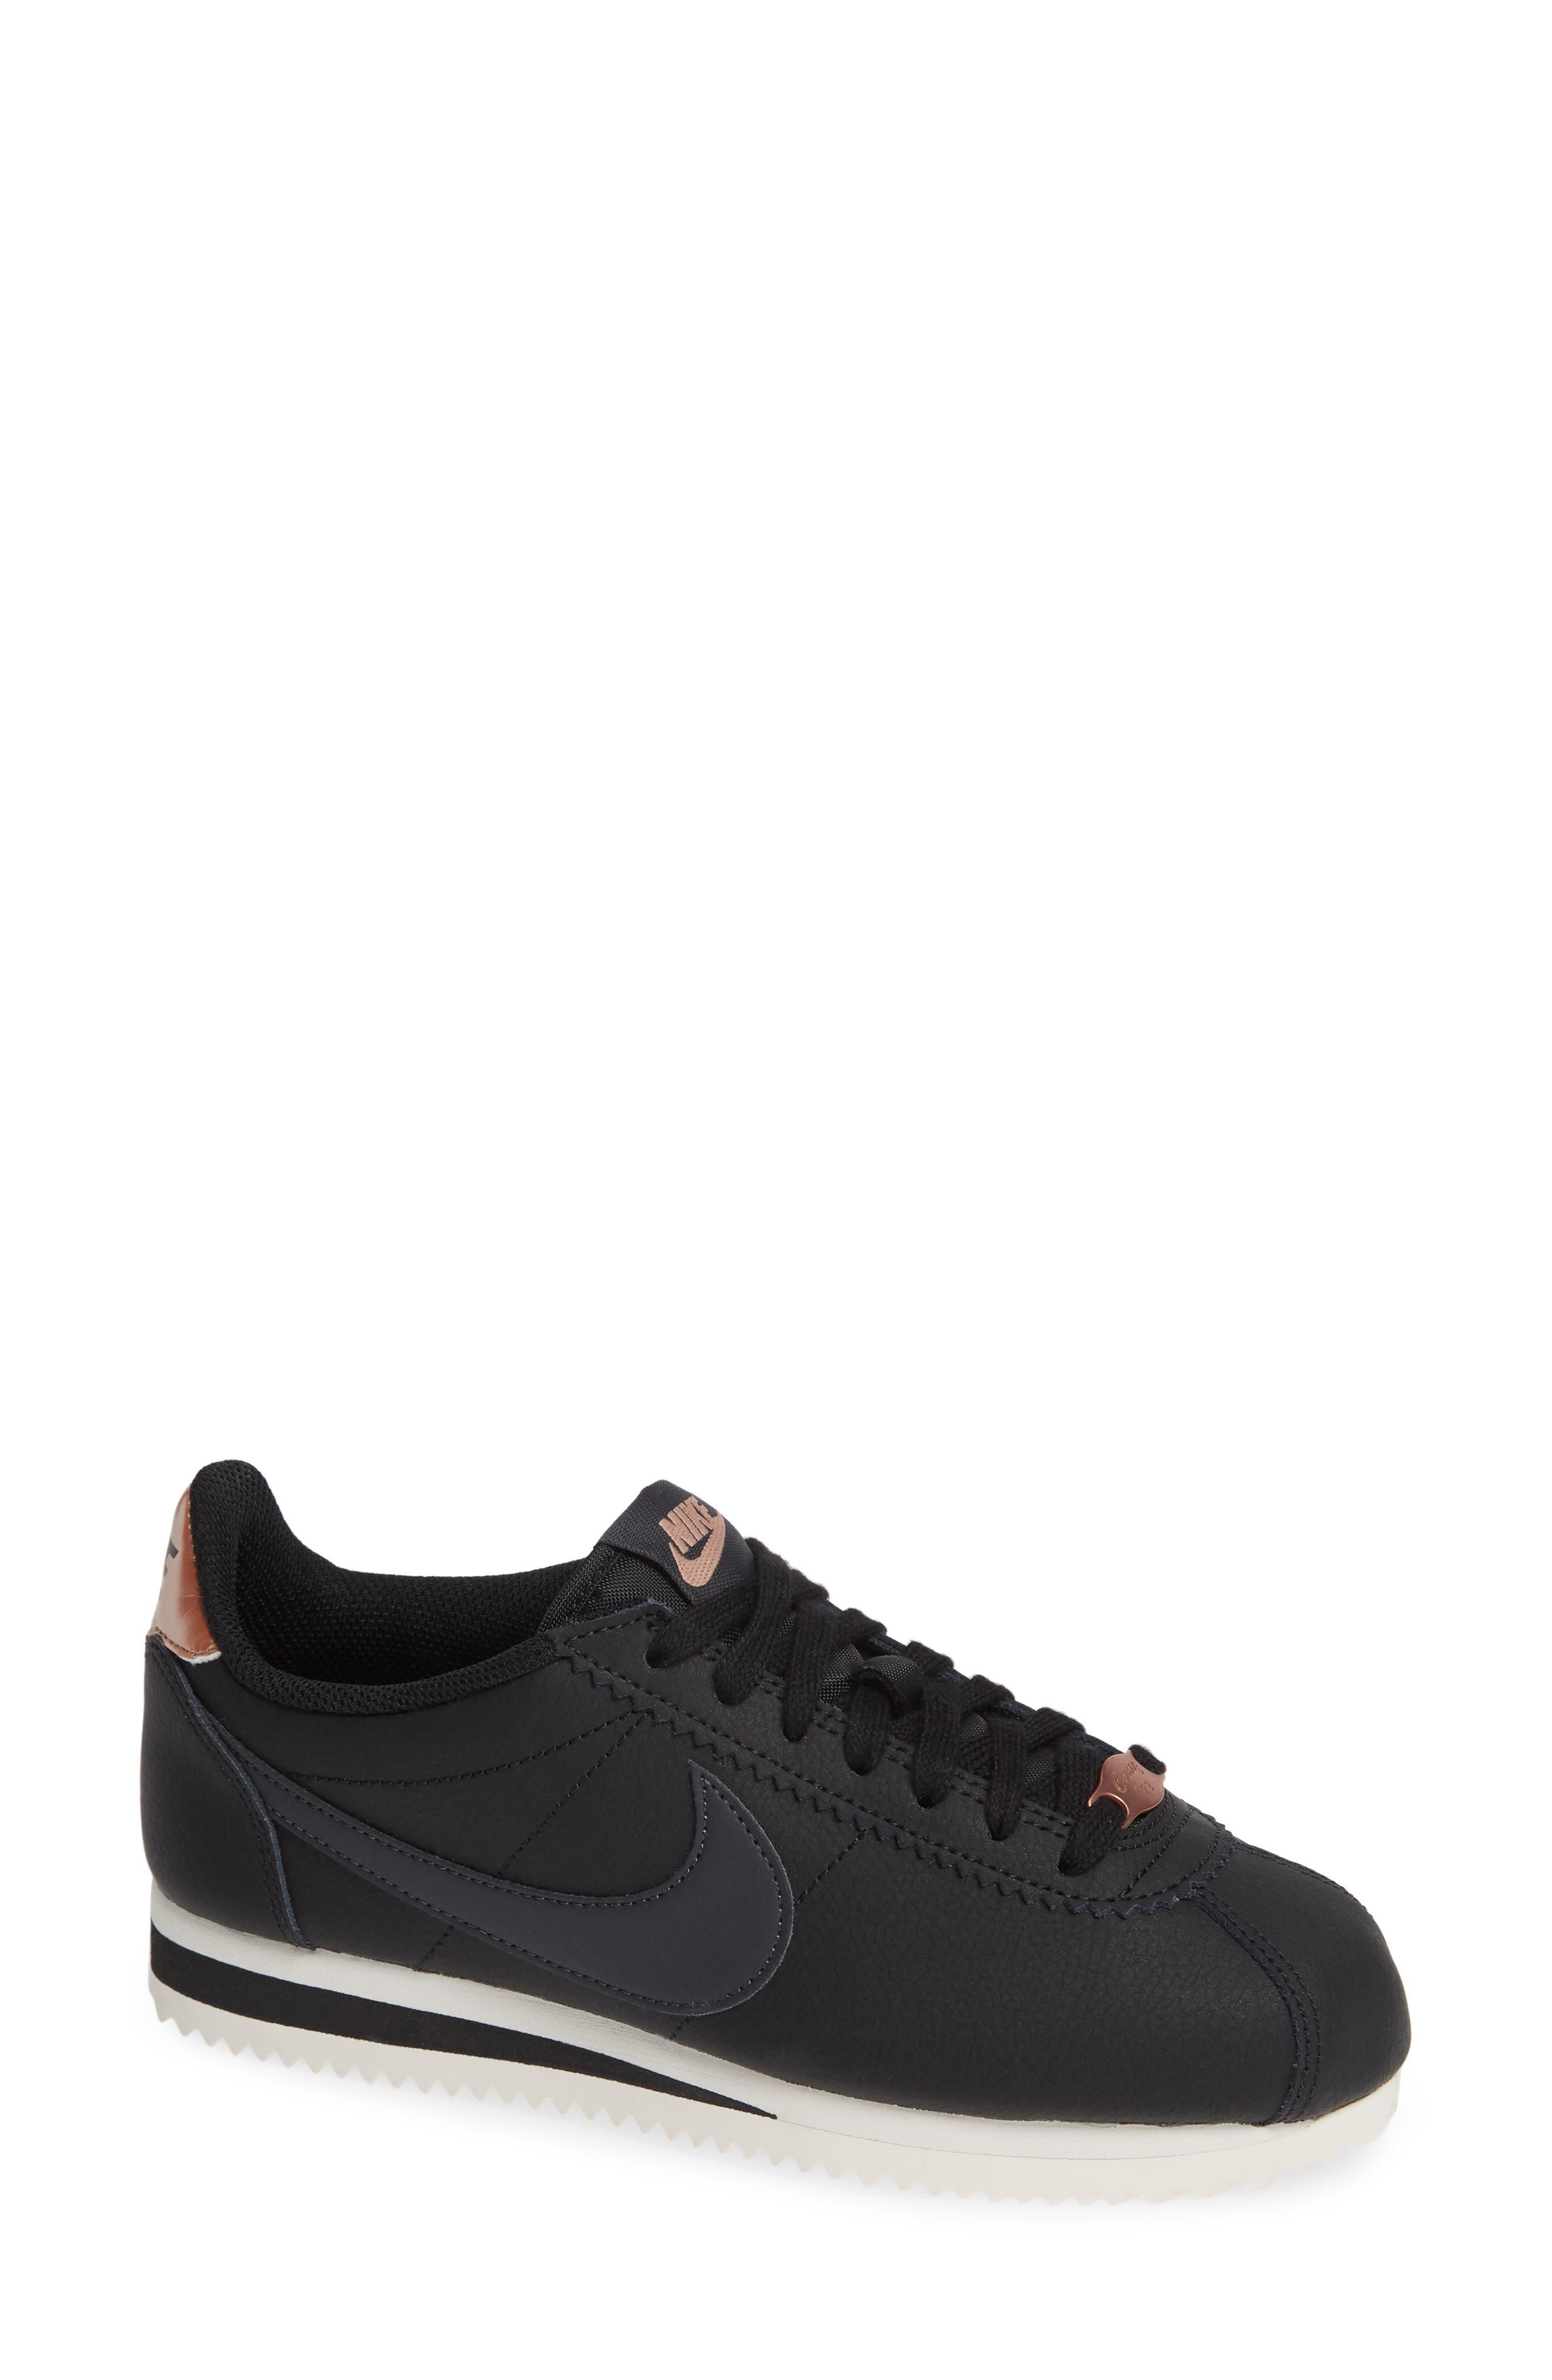 Classic Cortez Sneaker,                         Main,                         color, BLACK/ METALLIC RED BRONZE